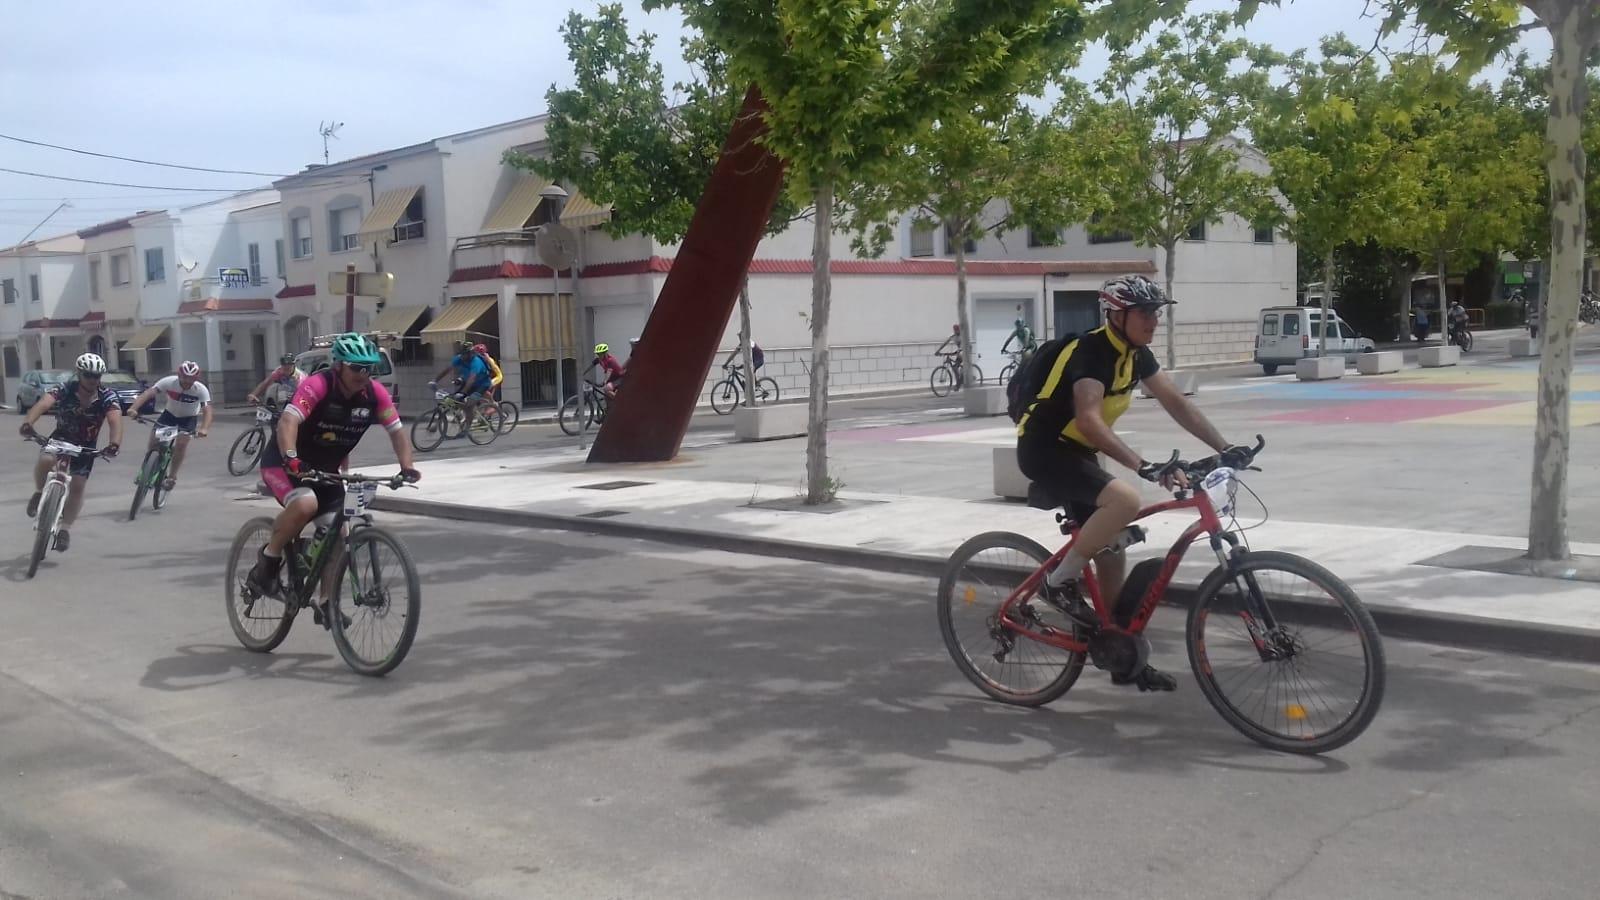 111 ciclistas participan en la III Ruta BTT de Casar de Cáceres